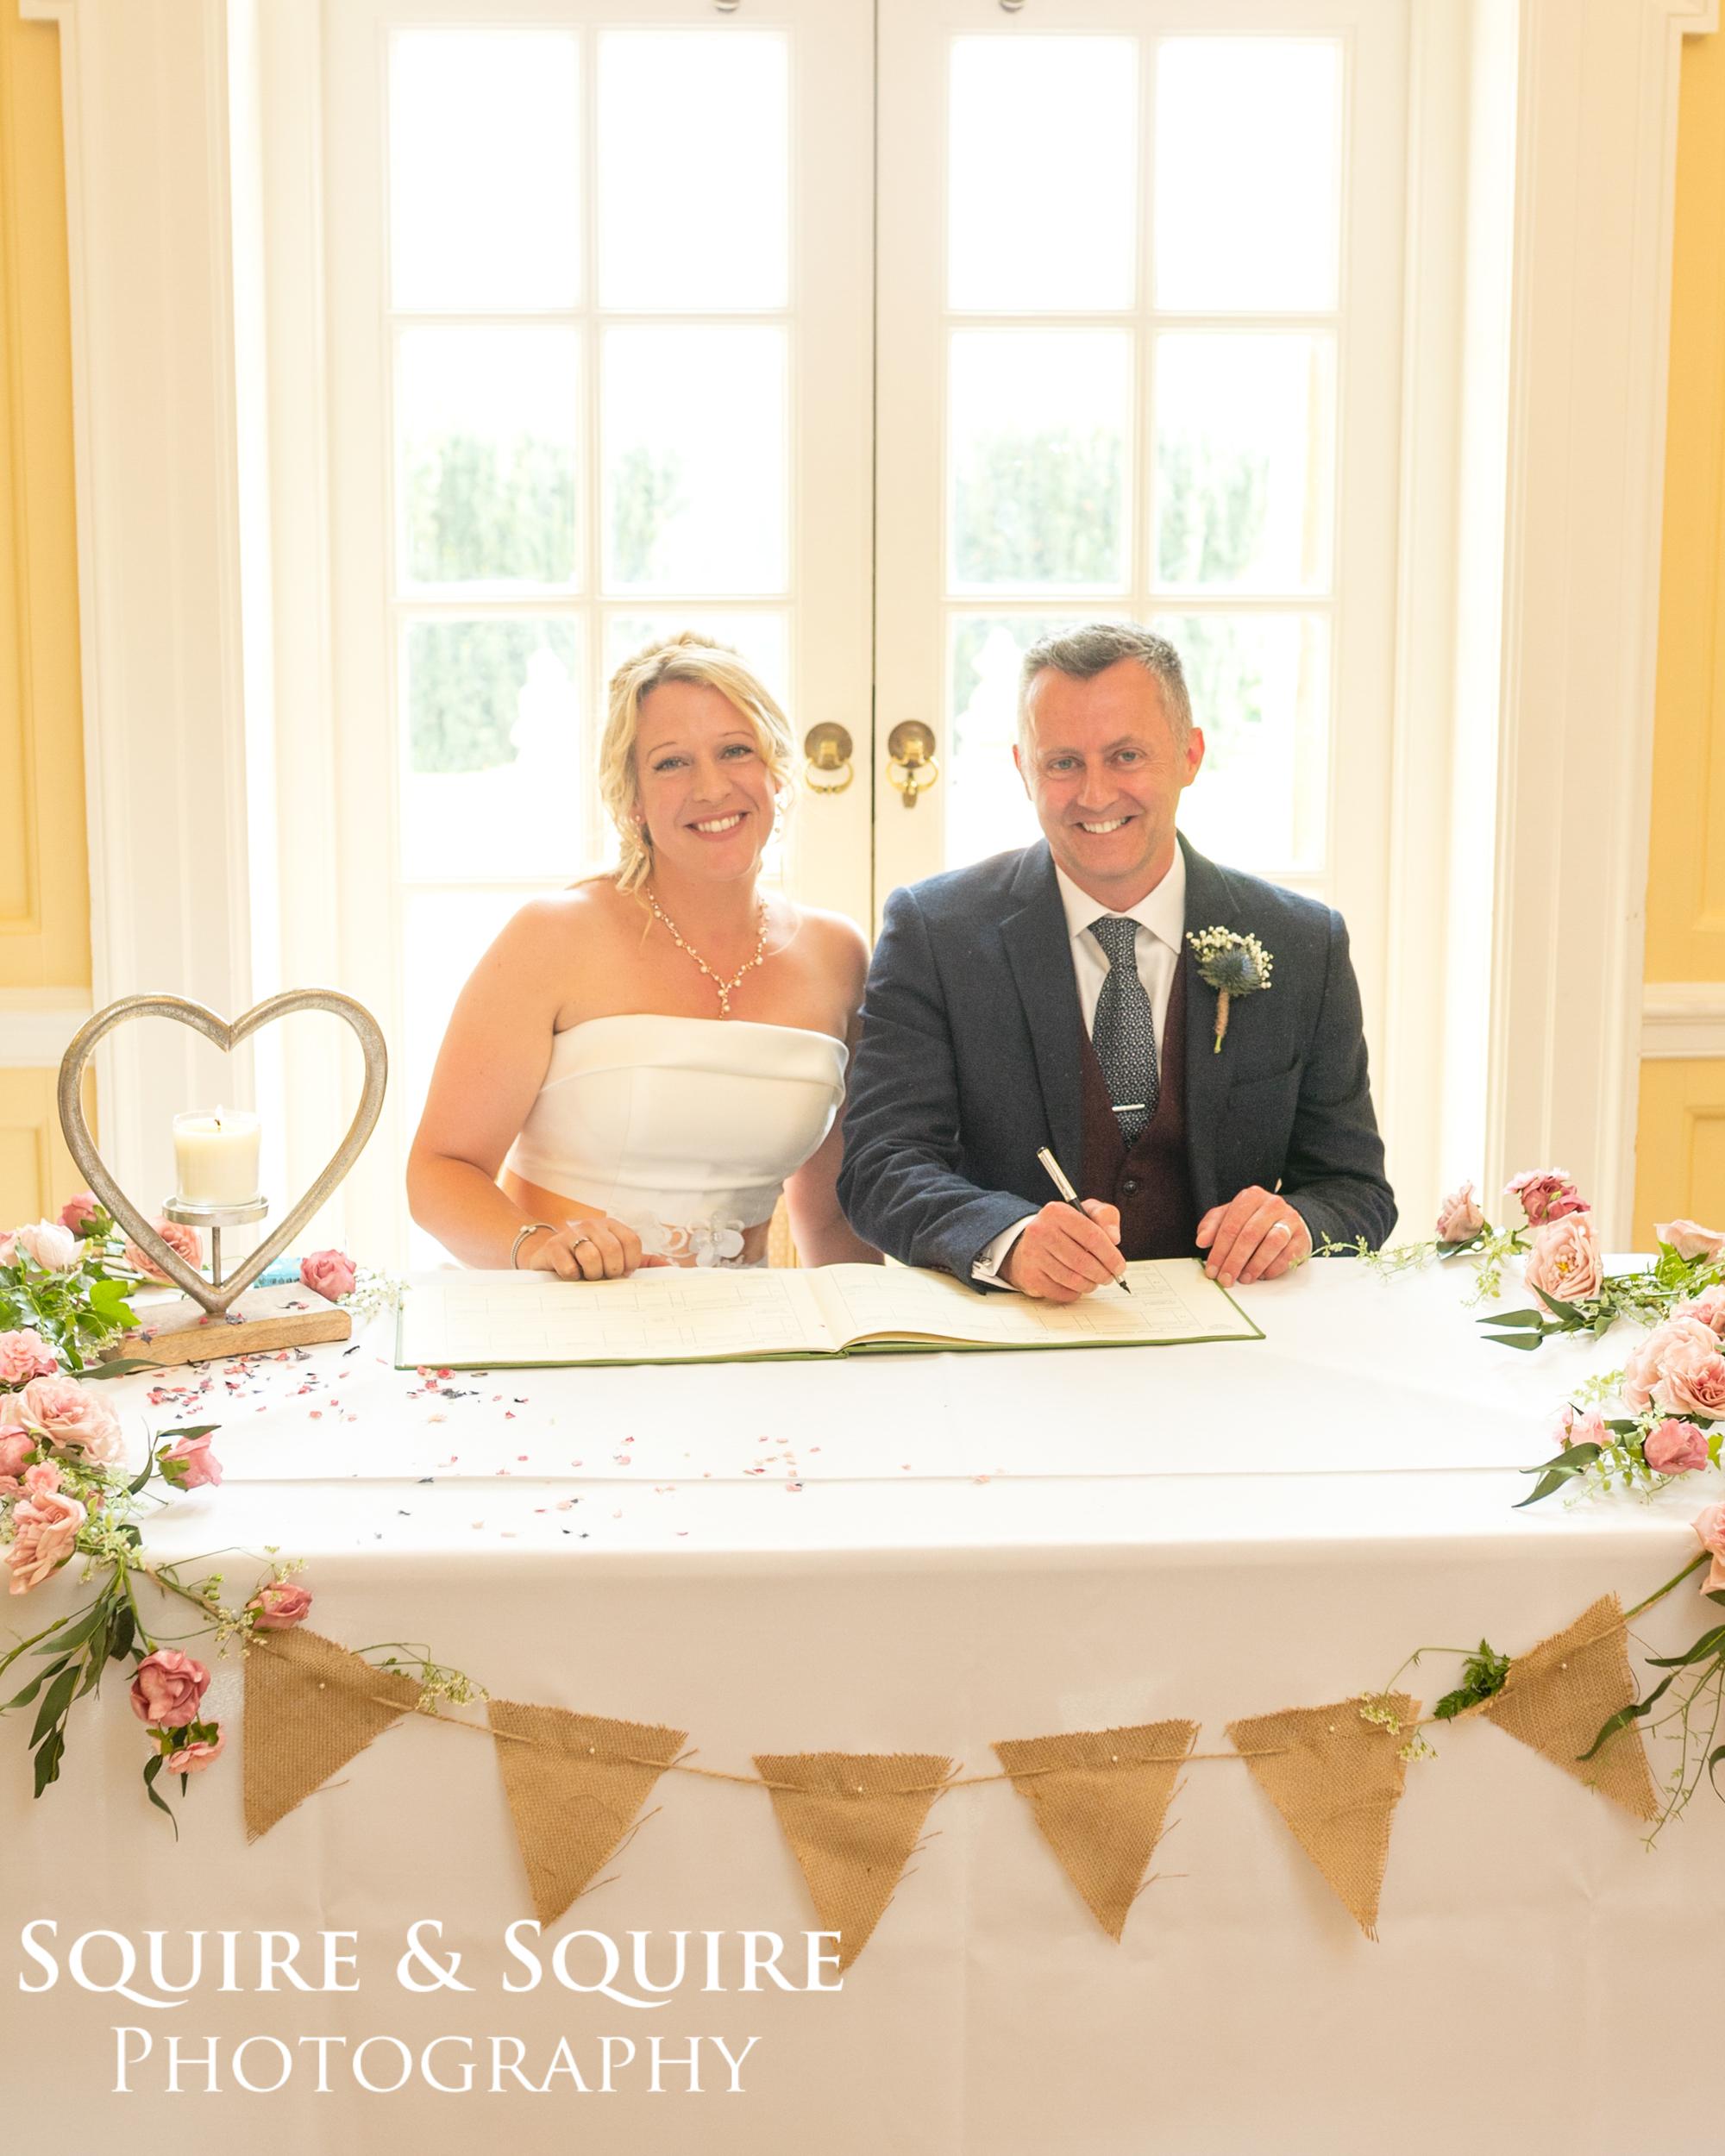 wedding_photography_catthorpe Manor (37 of 66).jpg